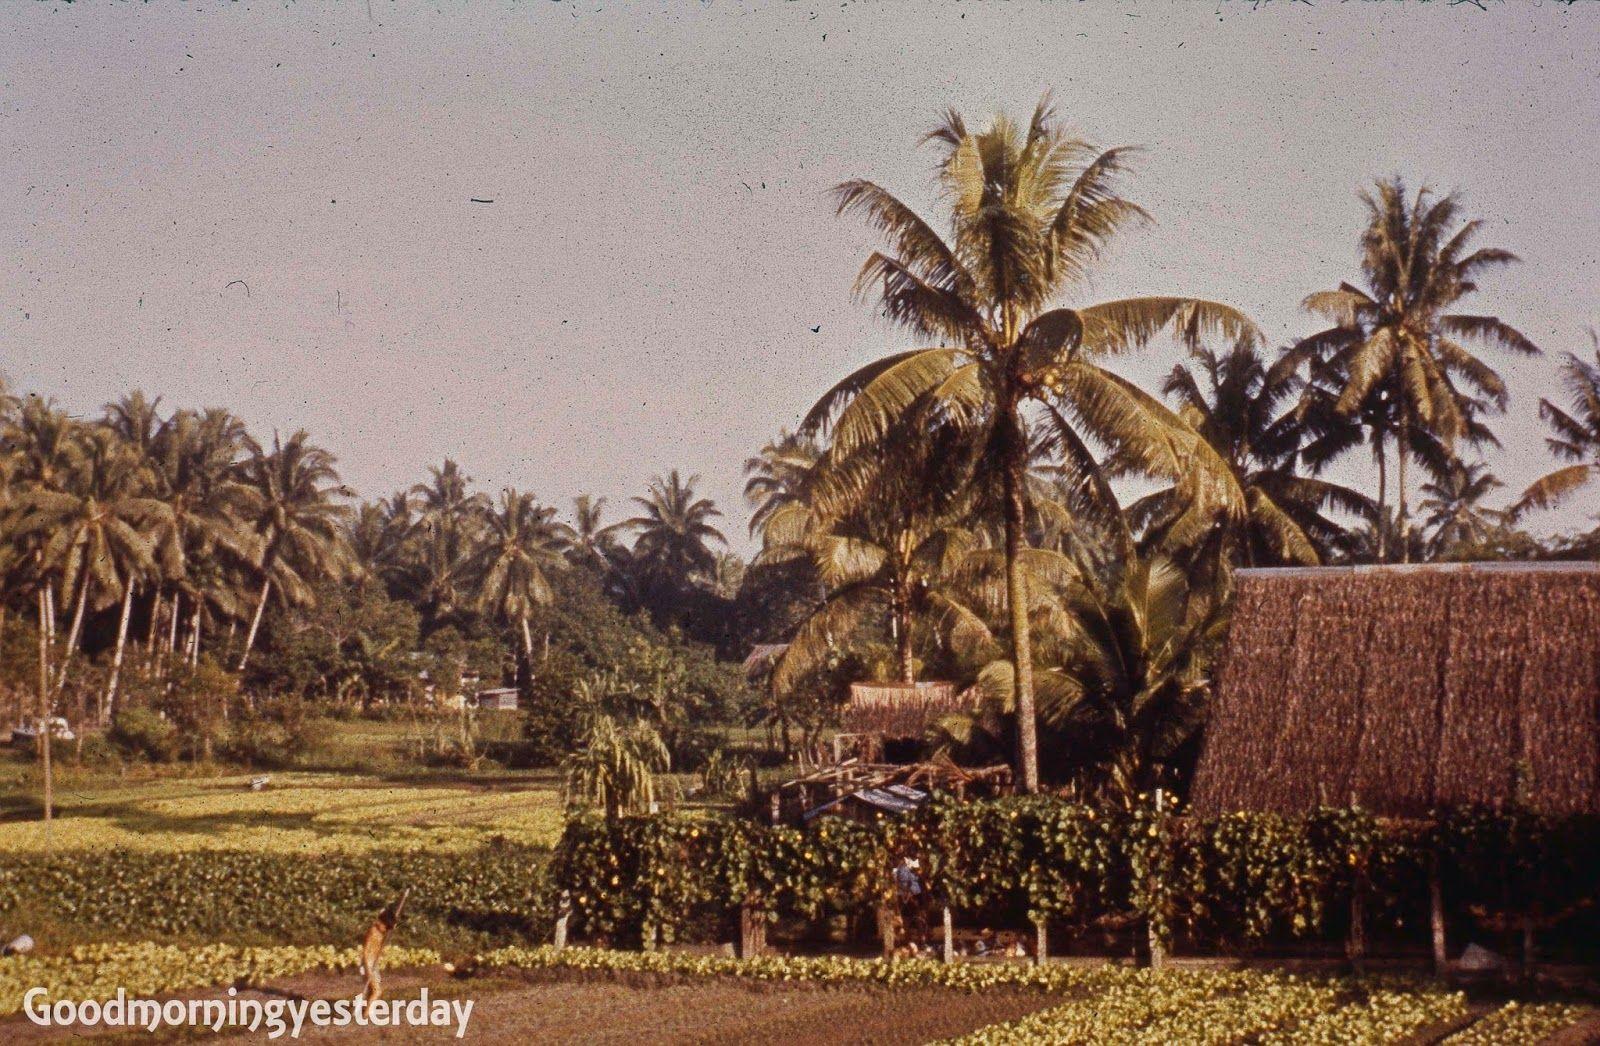 c1961. kampong in Lorong Chuan in 2020 Show me photos